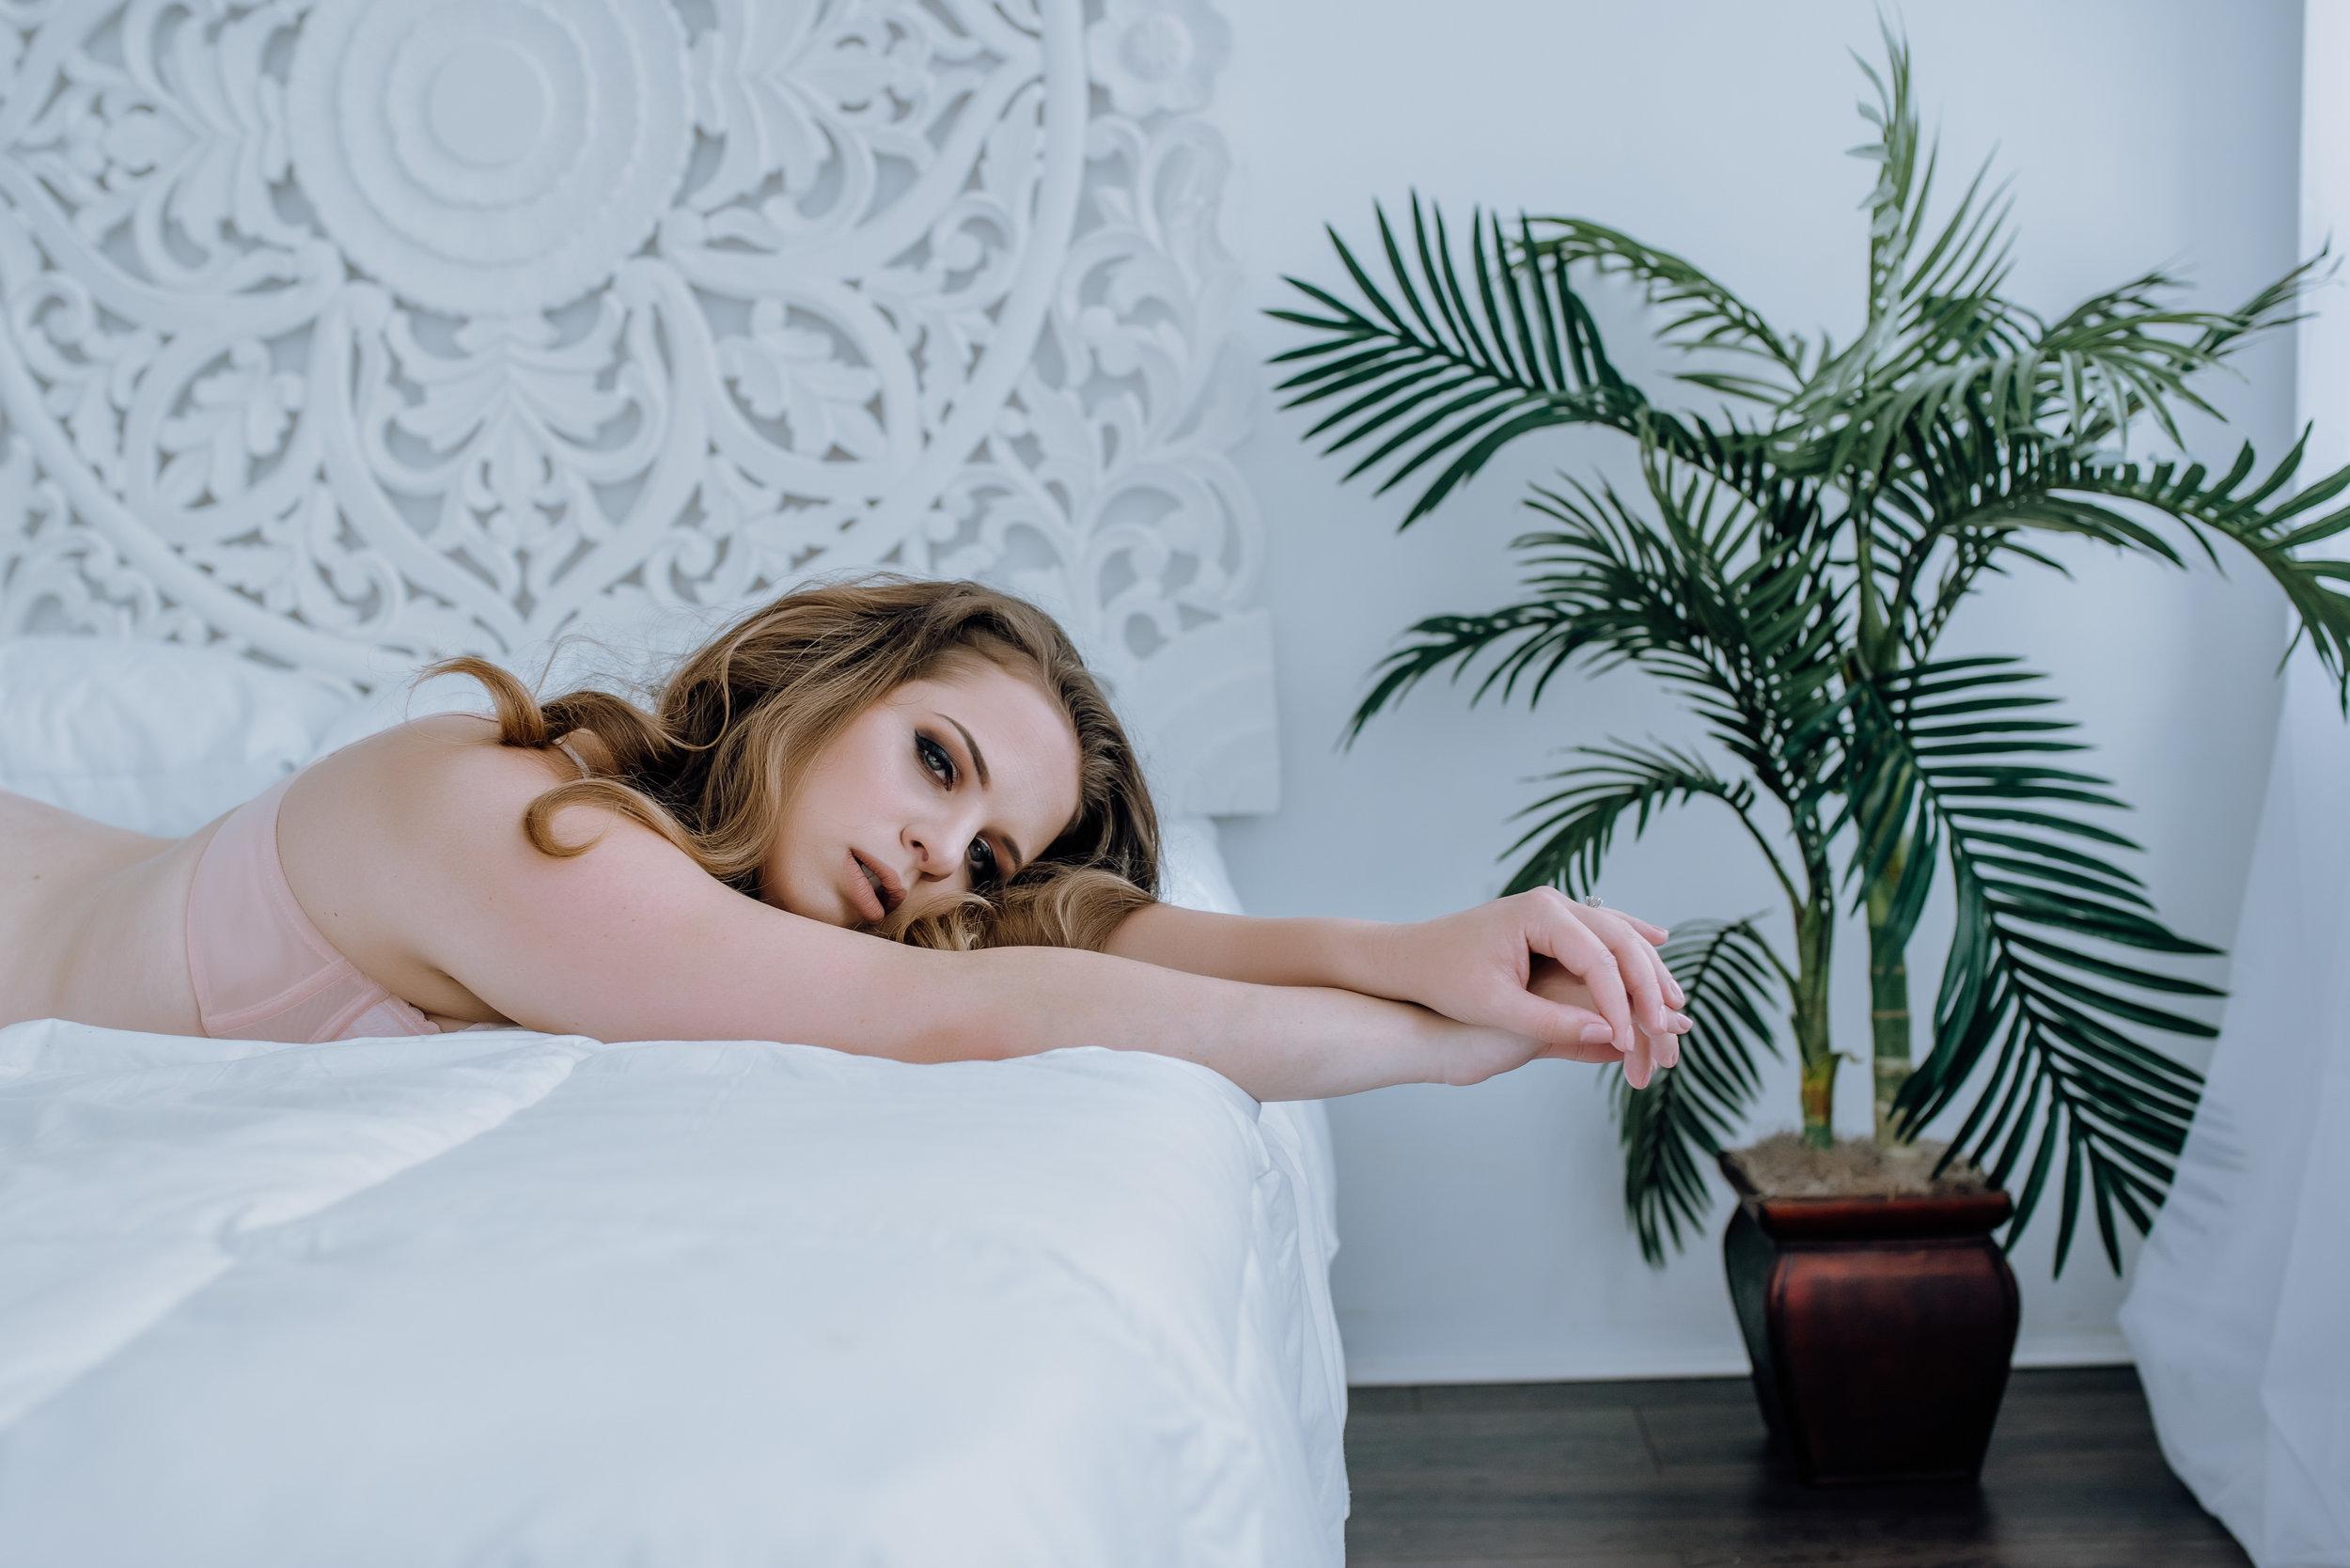 boudoir-photography-best-in-berks-25.jpg